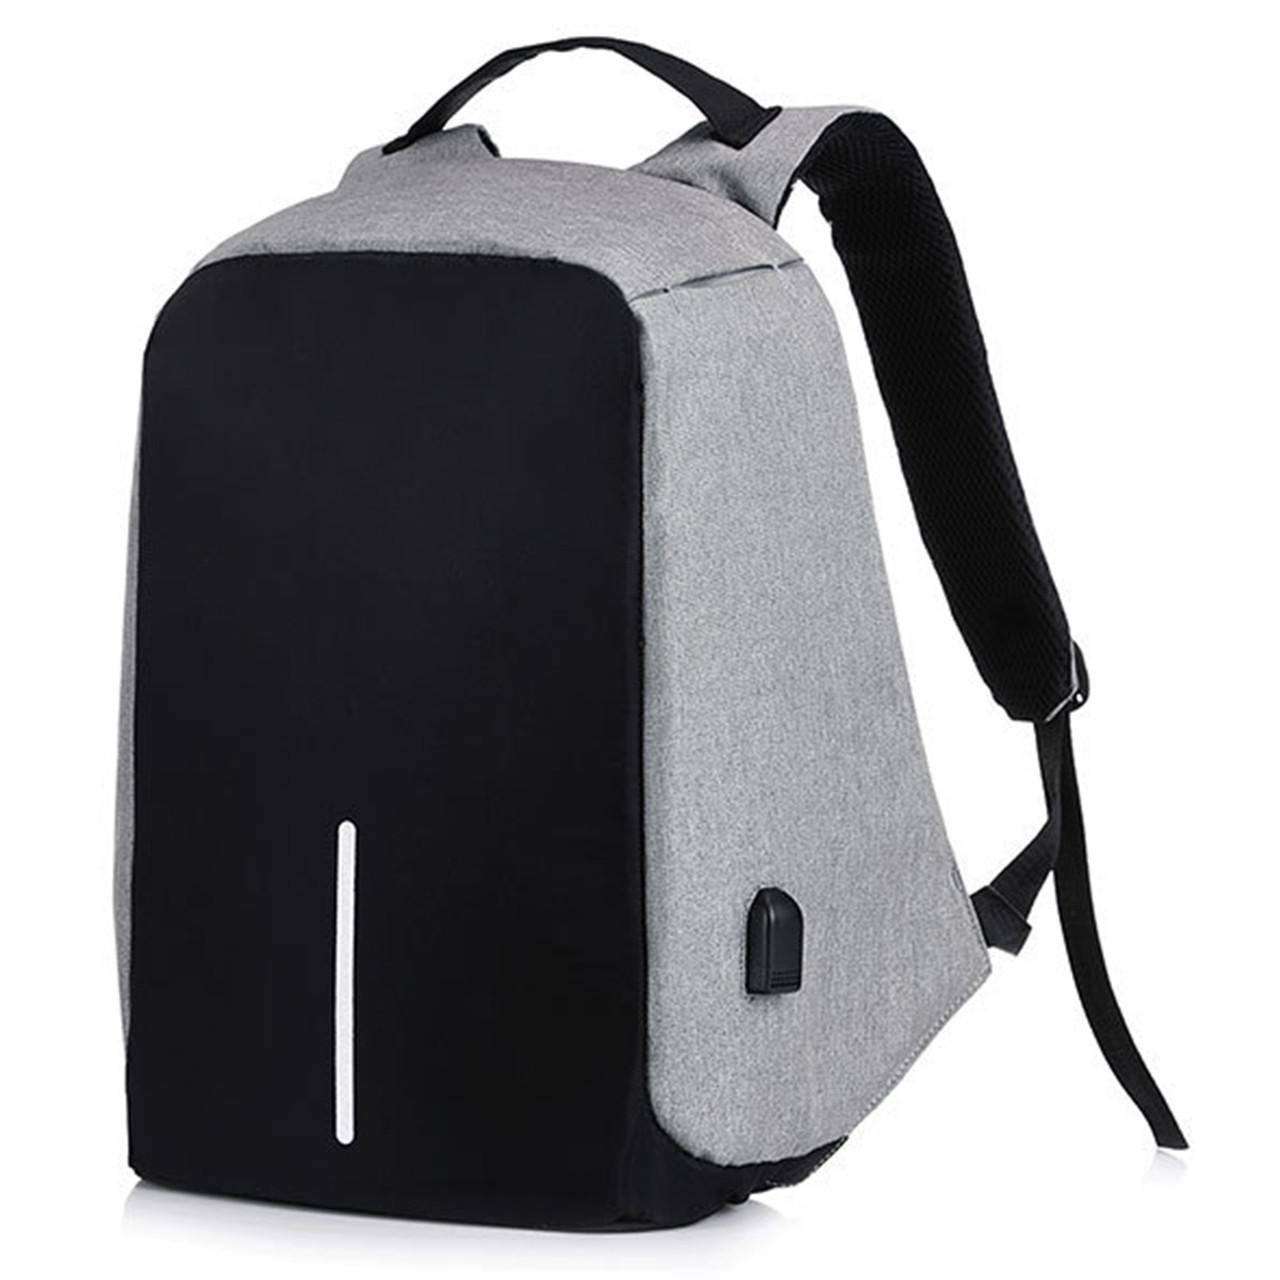 Рюкзак антивор Bobby с USB портом Bobby Серый